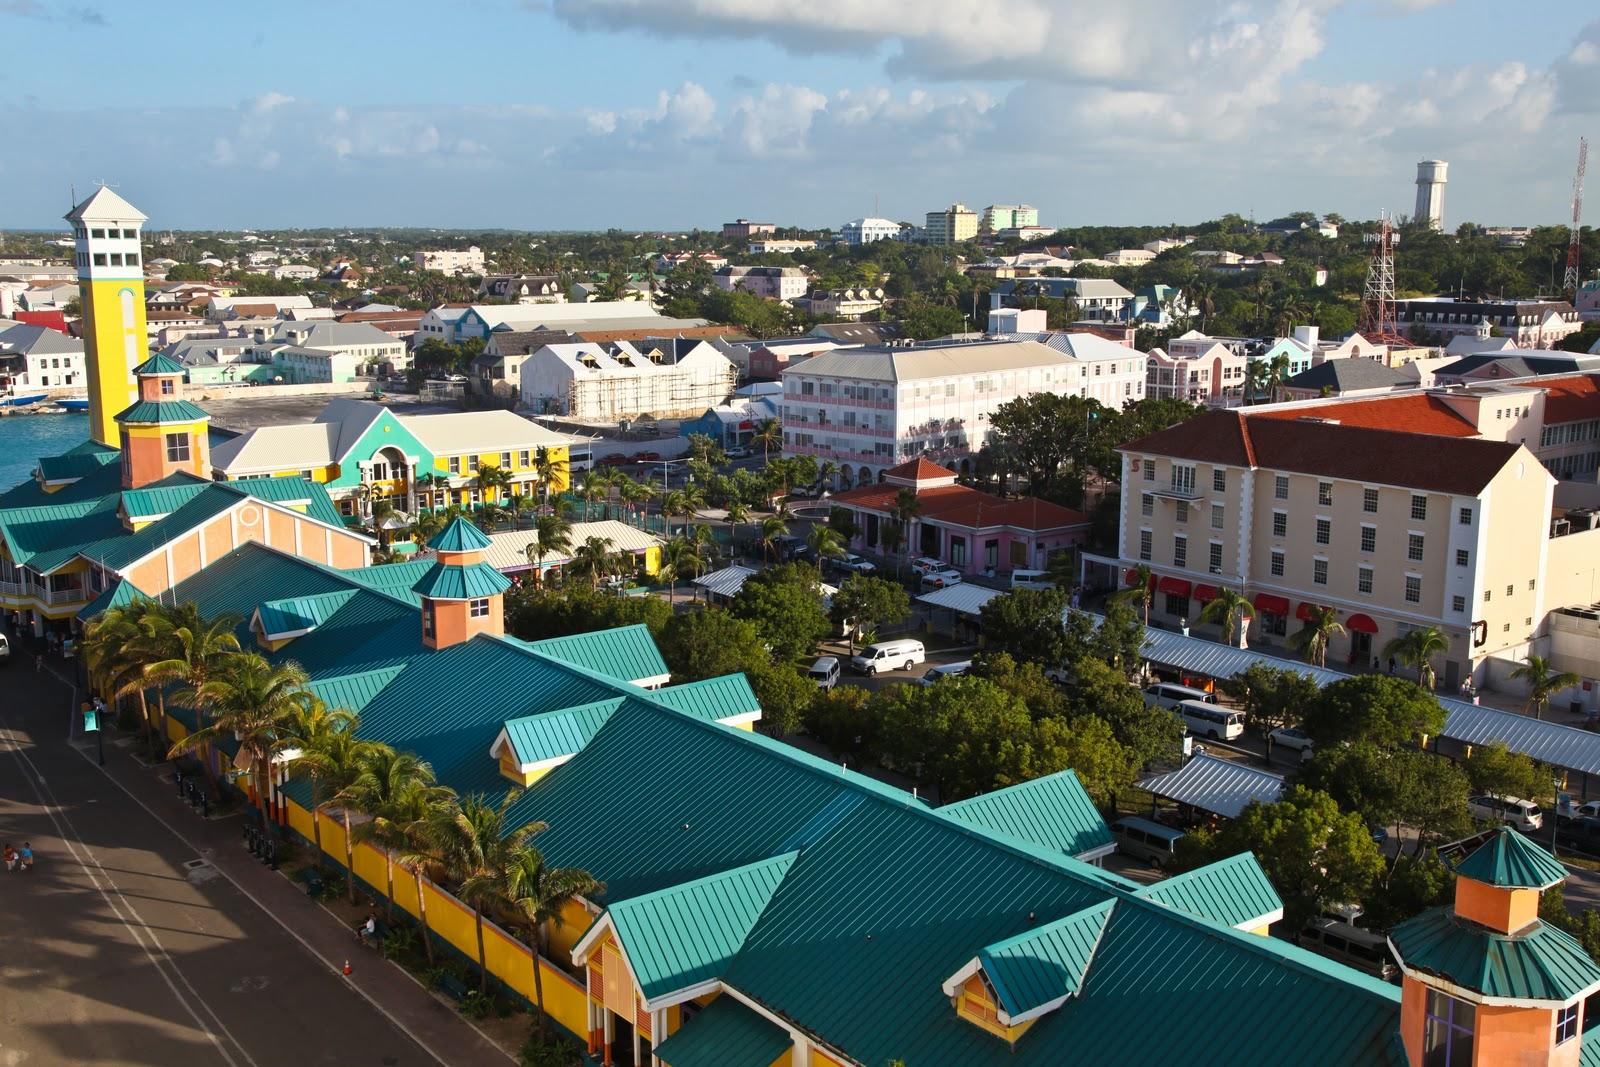 Angelyn's Photo Blog: Royal Caribbean's 3 Day Bahama's